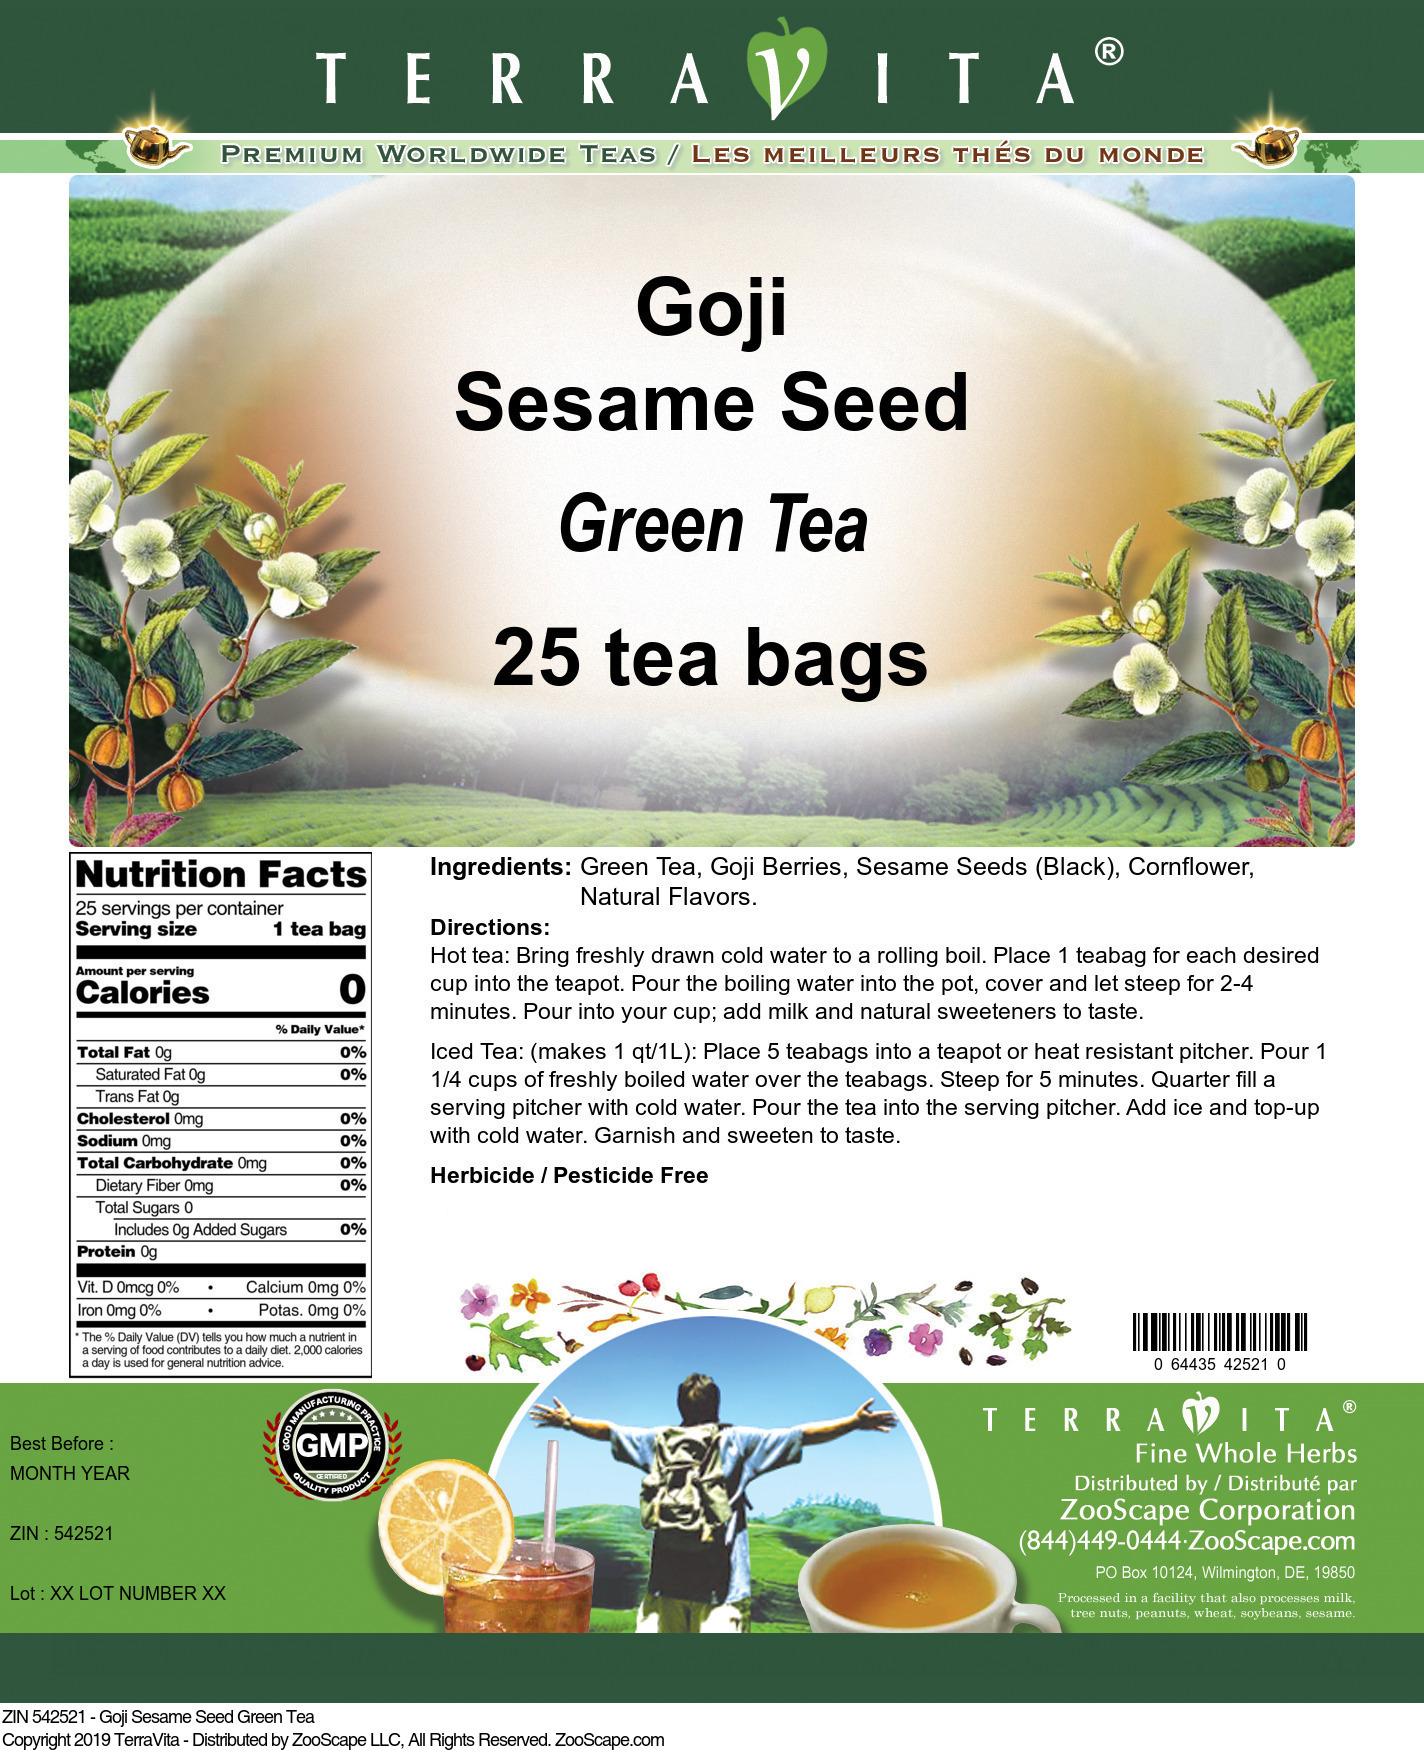 Goji Sesame Seed Green Tea